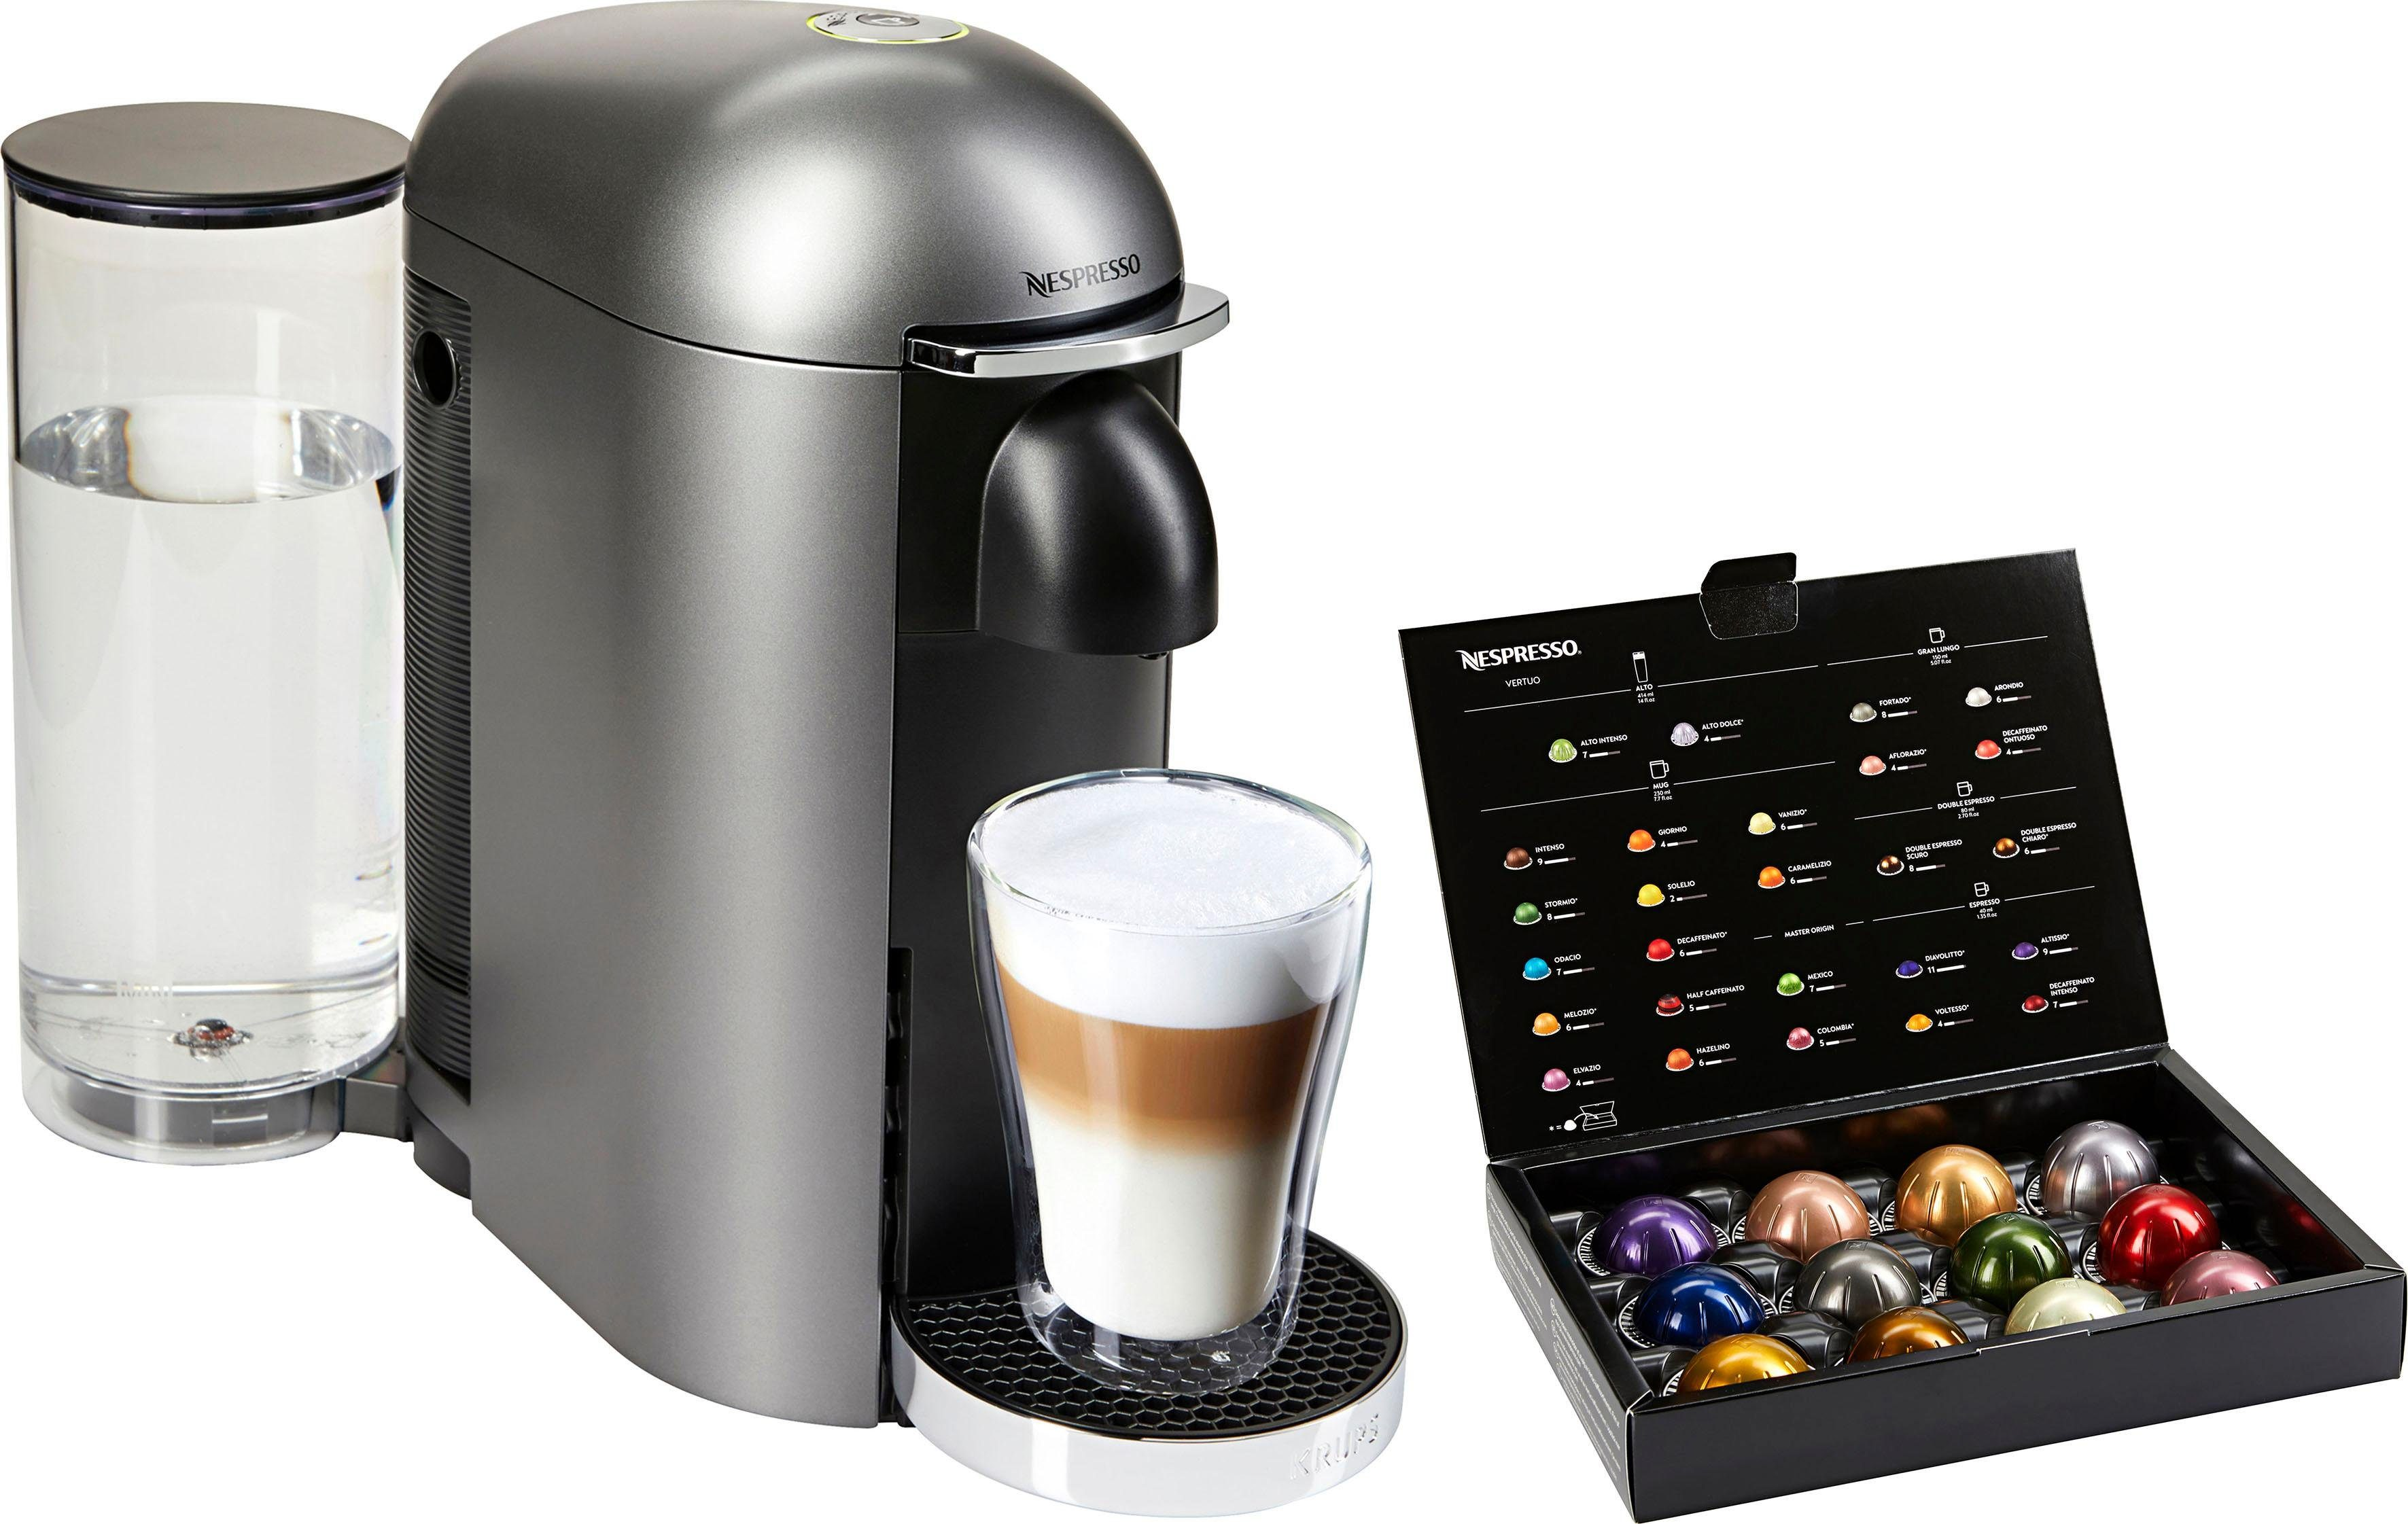 Nespresso Kapselmaschine XN900T Vertuo Plus, mit neuartigem Kapselsystem